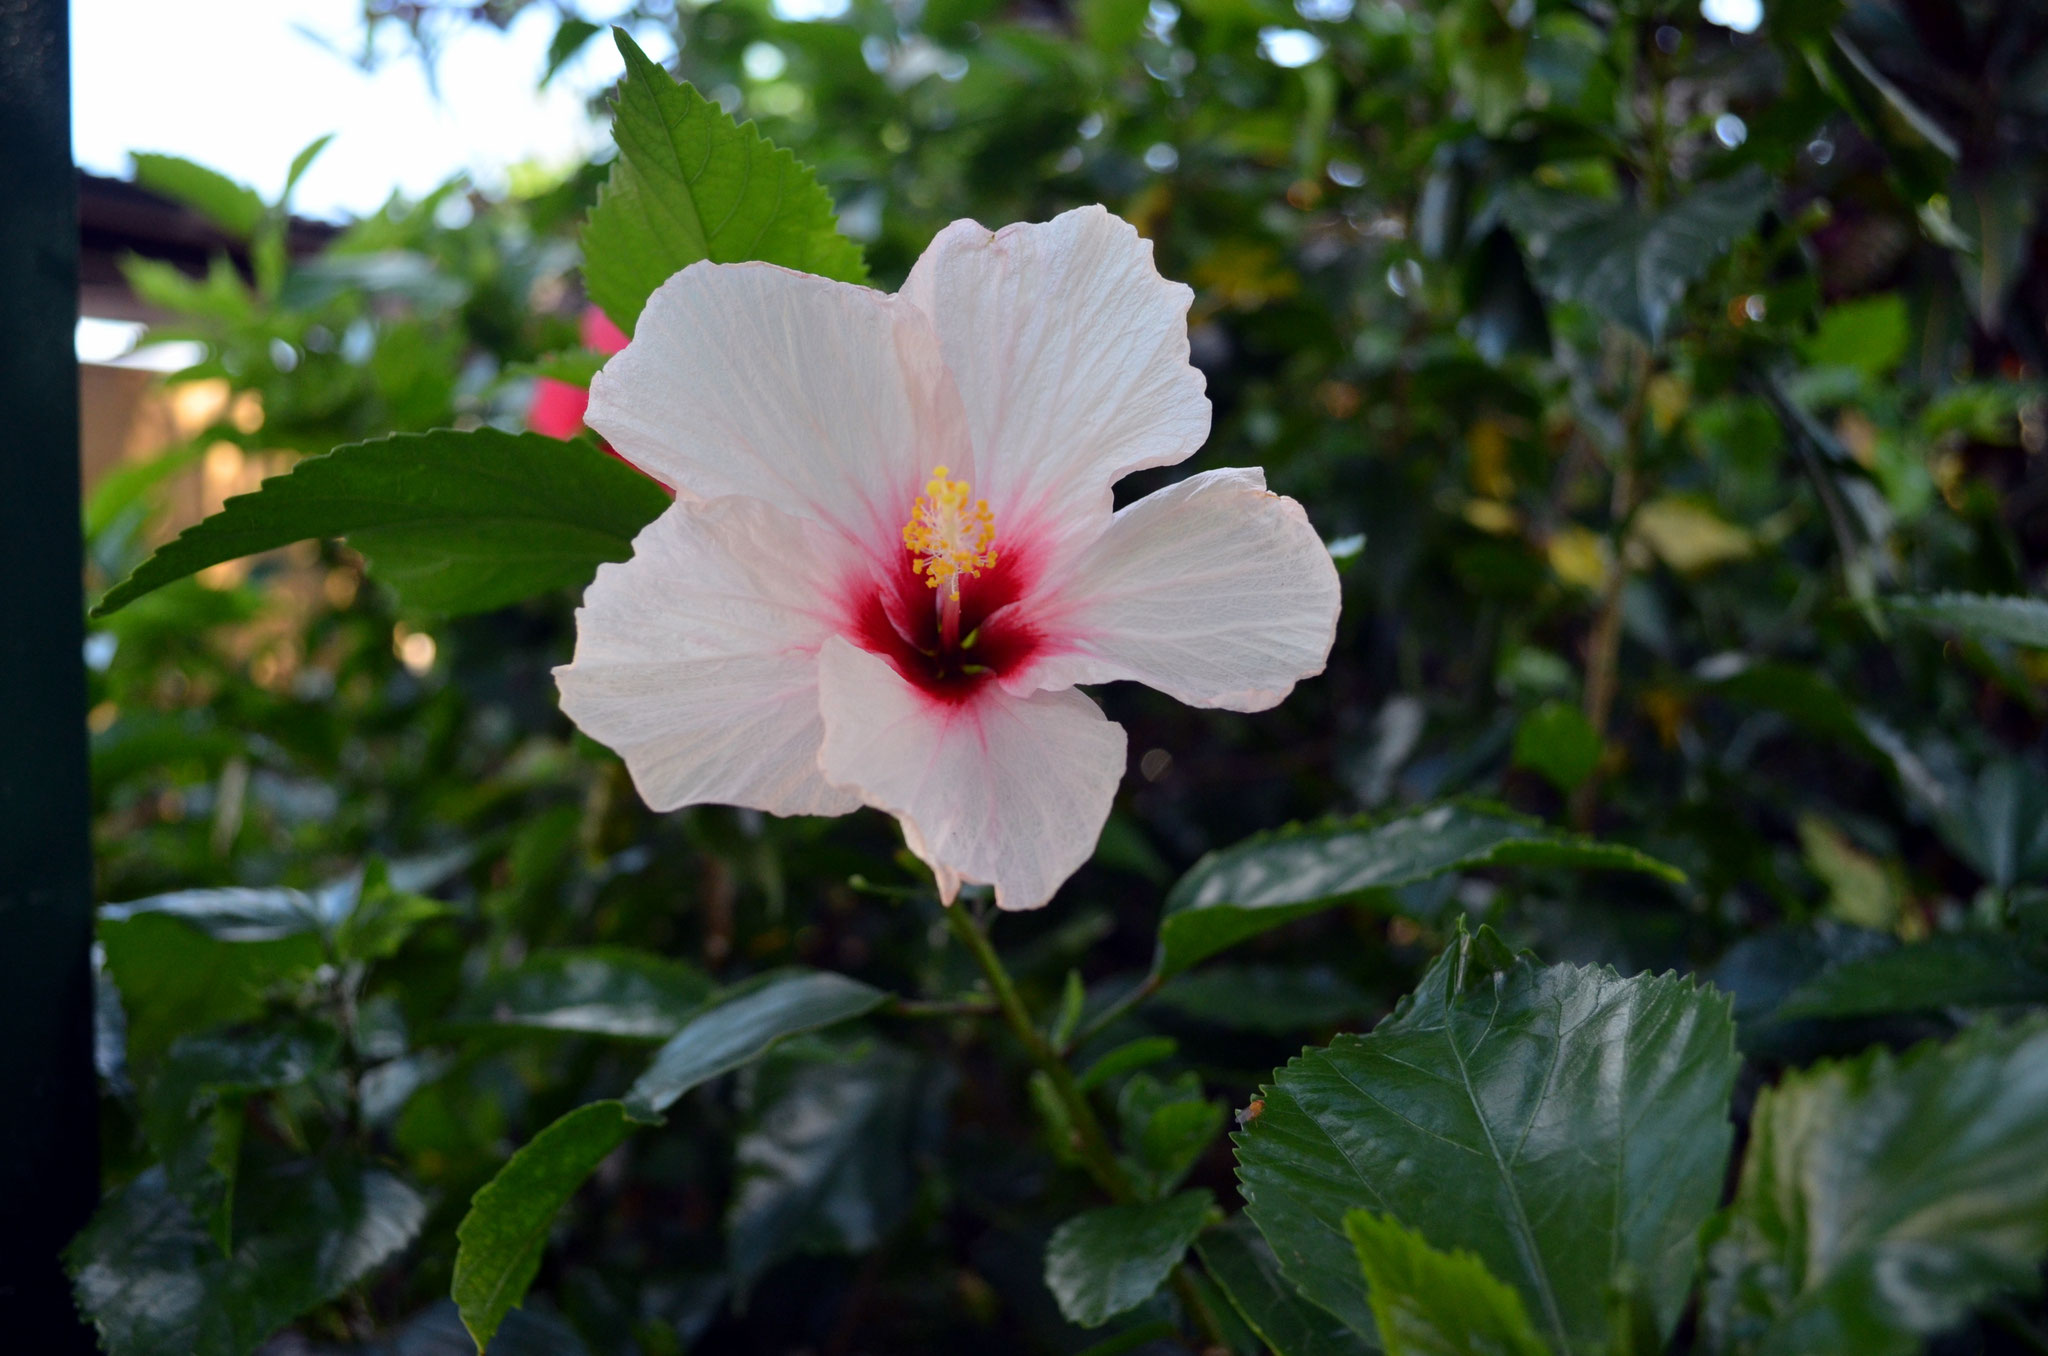 Okinawa World – Hibiskus überall auf Okinawa beliebt